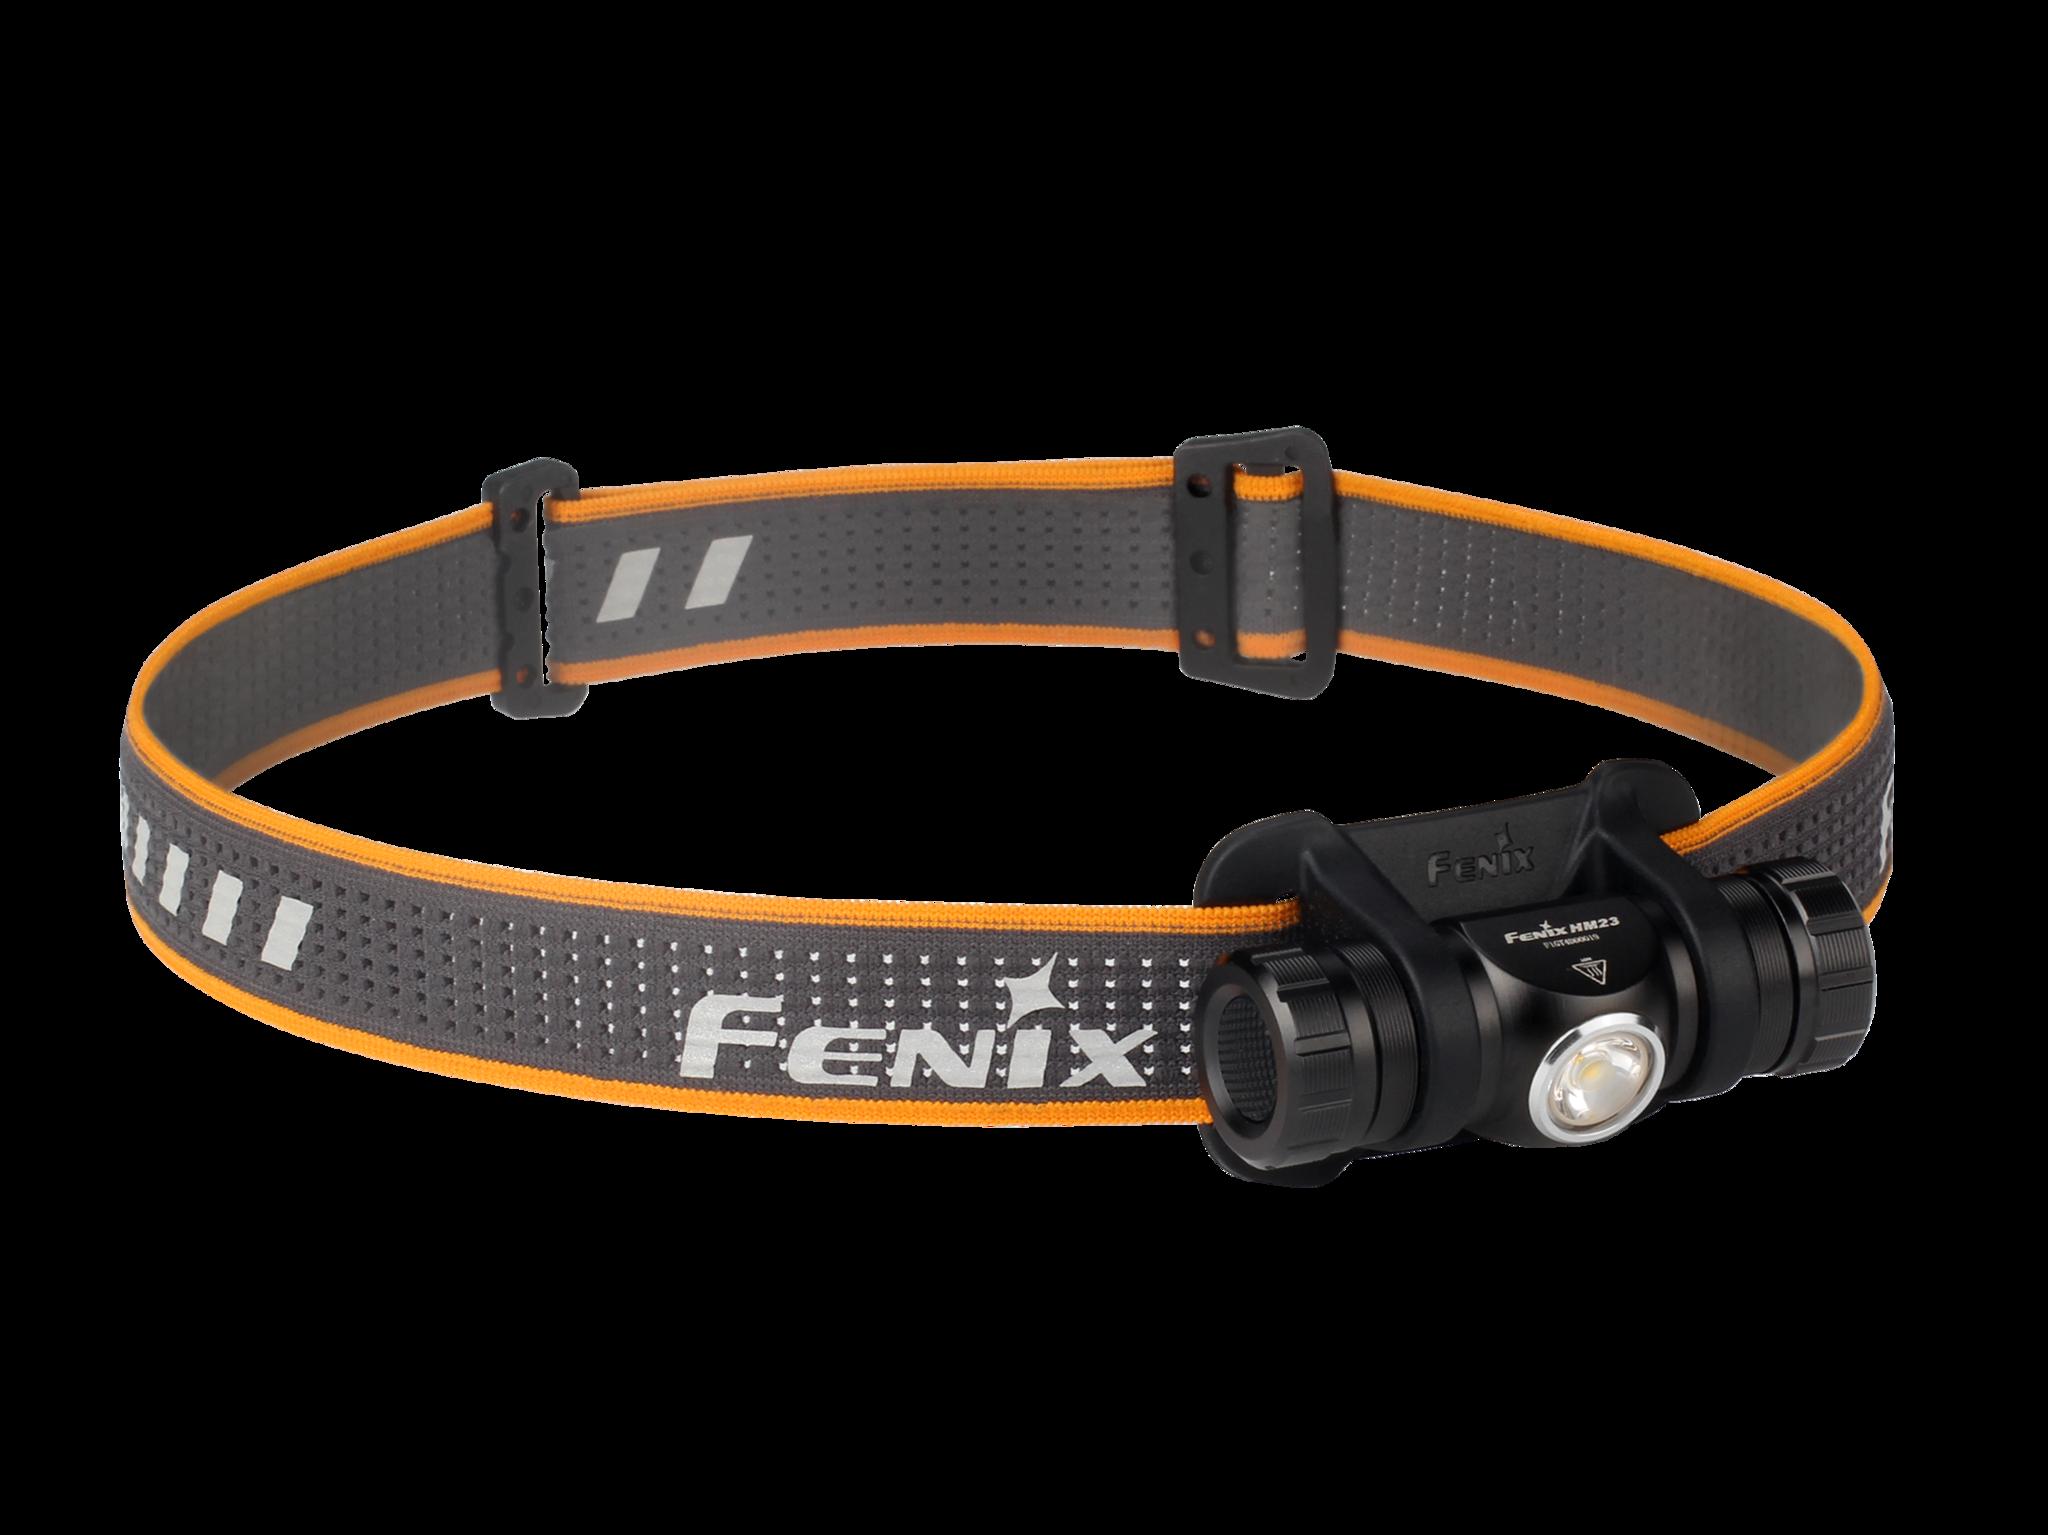 Налобный фонарь Fenix HM23 Cree XP-G2 (R5), 240 лм